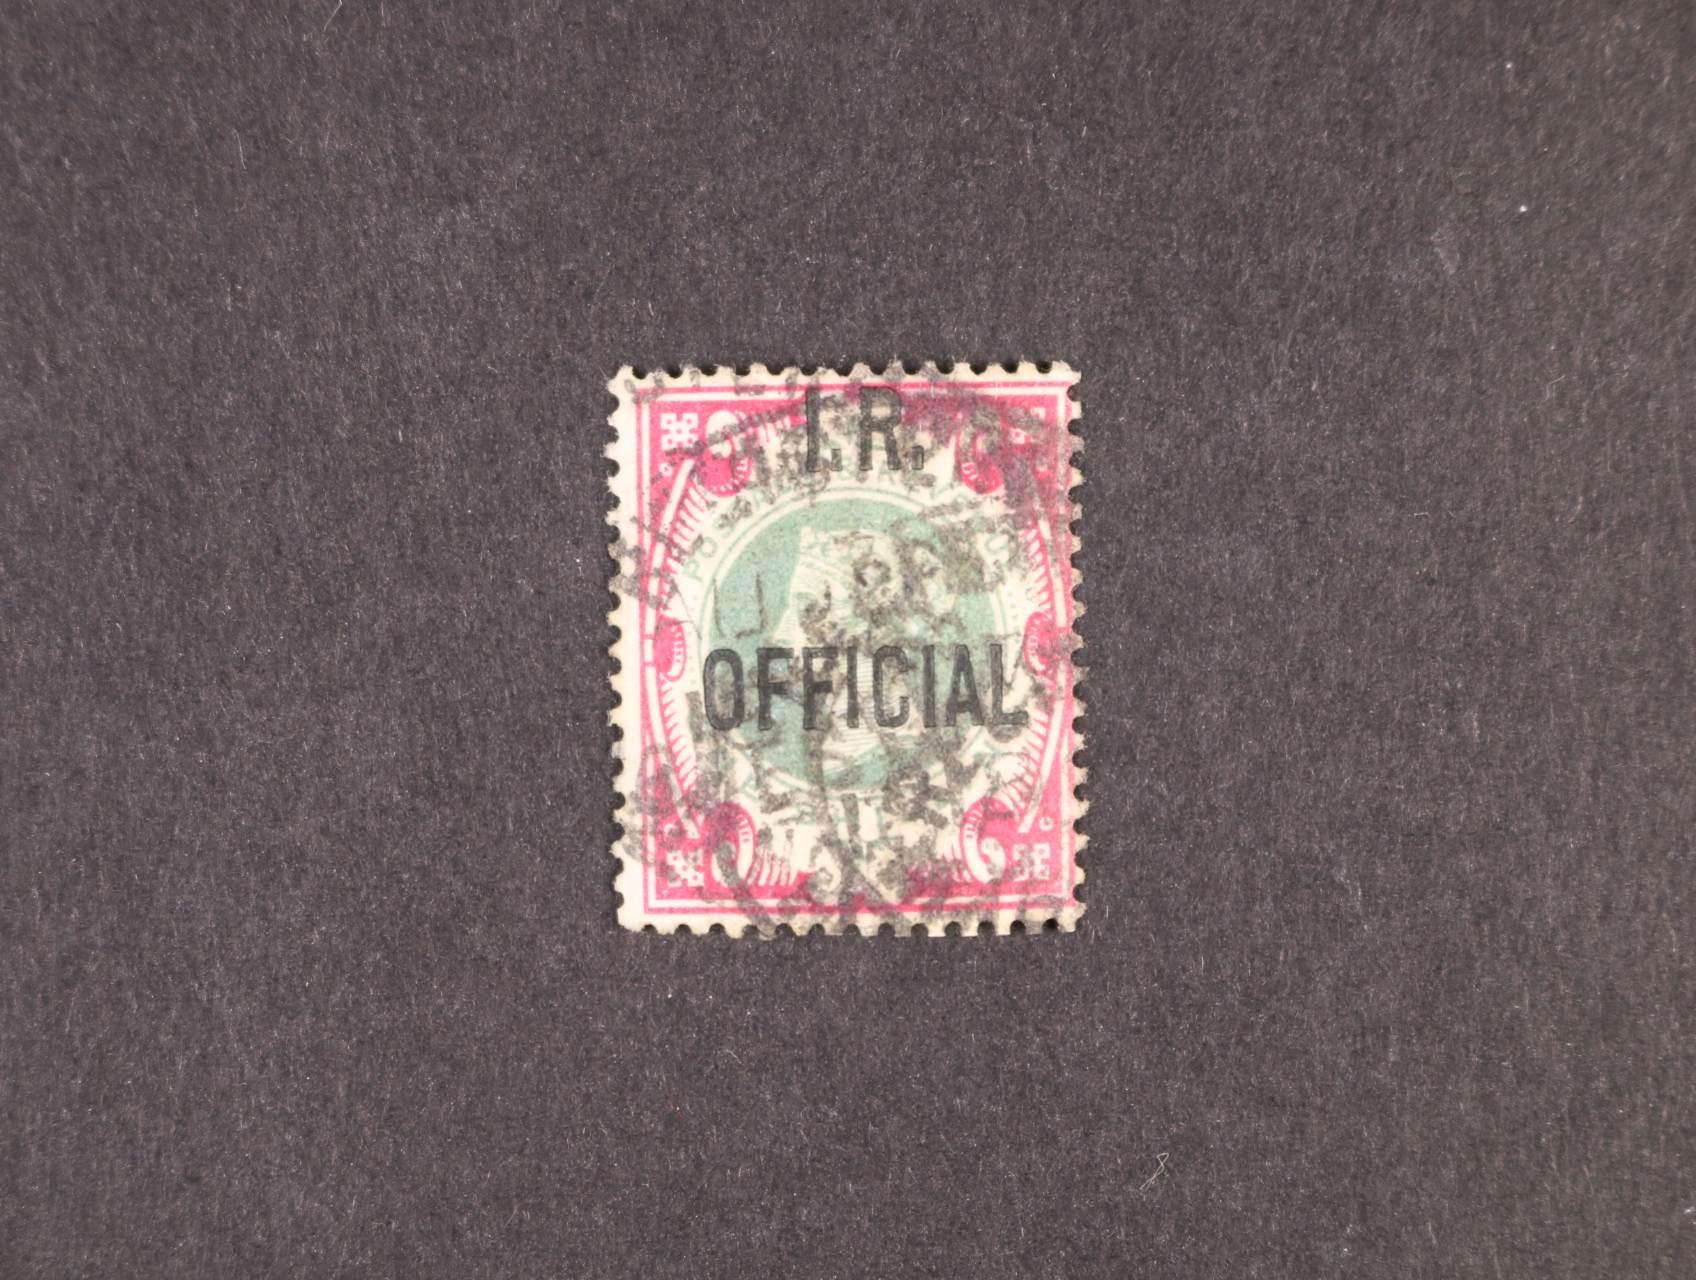 zn. SG č. 19, atest B.P.A. Expertising Limited London England, kat. cena 1800 Liber